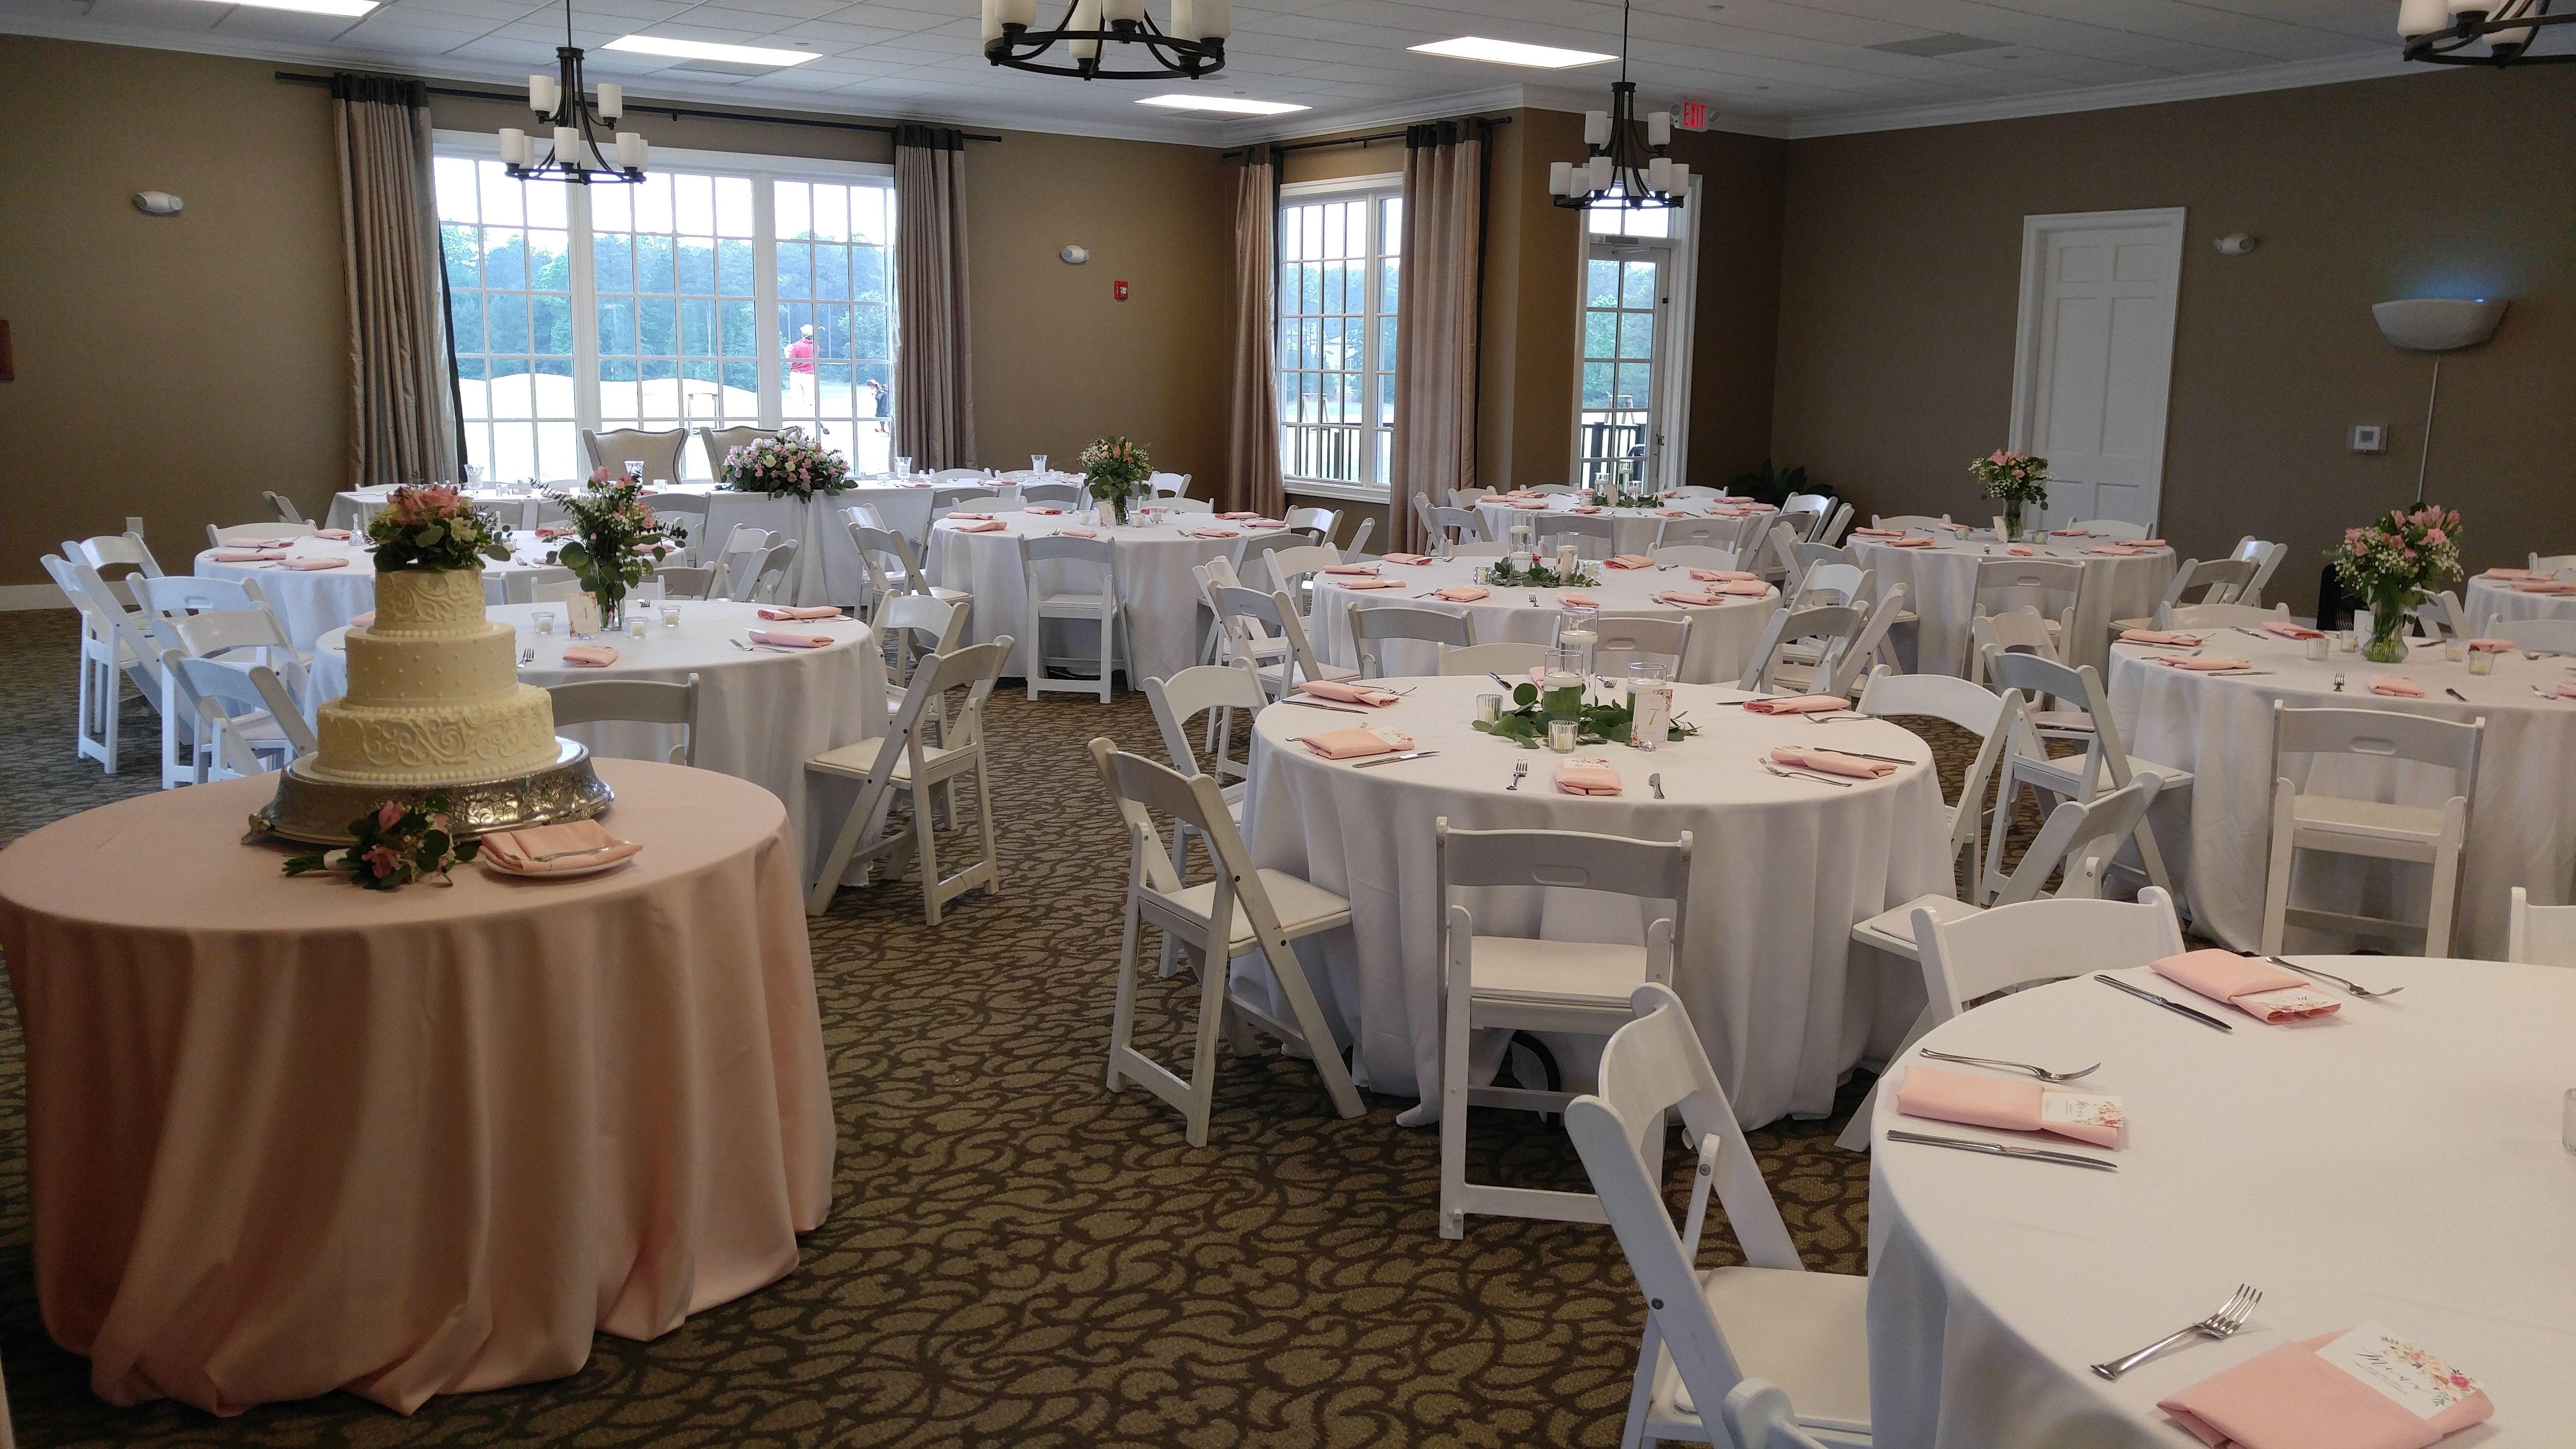 Cobblestone Park Golf Club Blythewood Sc Wedding Reception Venues Vintage Bakery Reception Venues